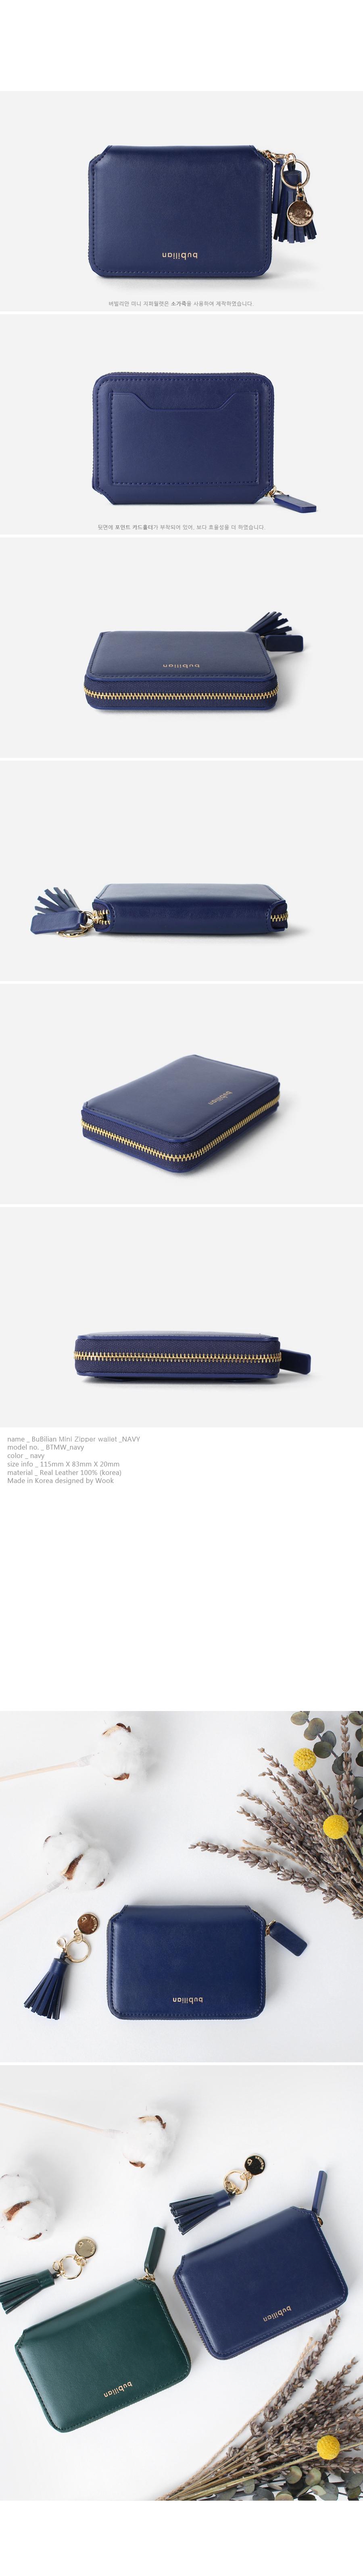 mini-wallet-navy-900-2.jpg